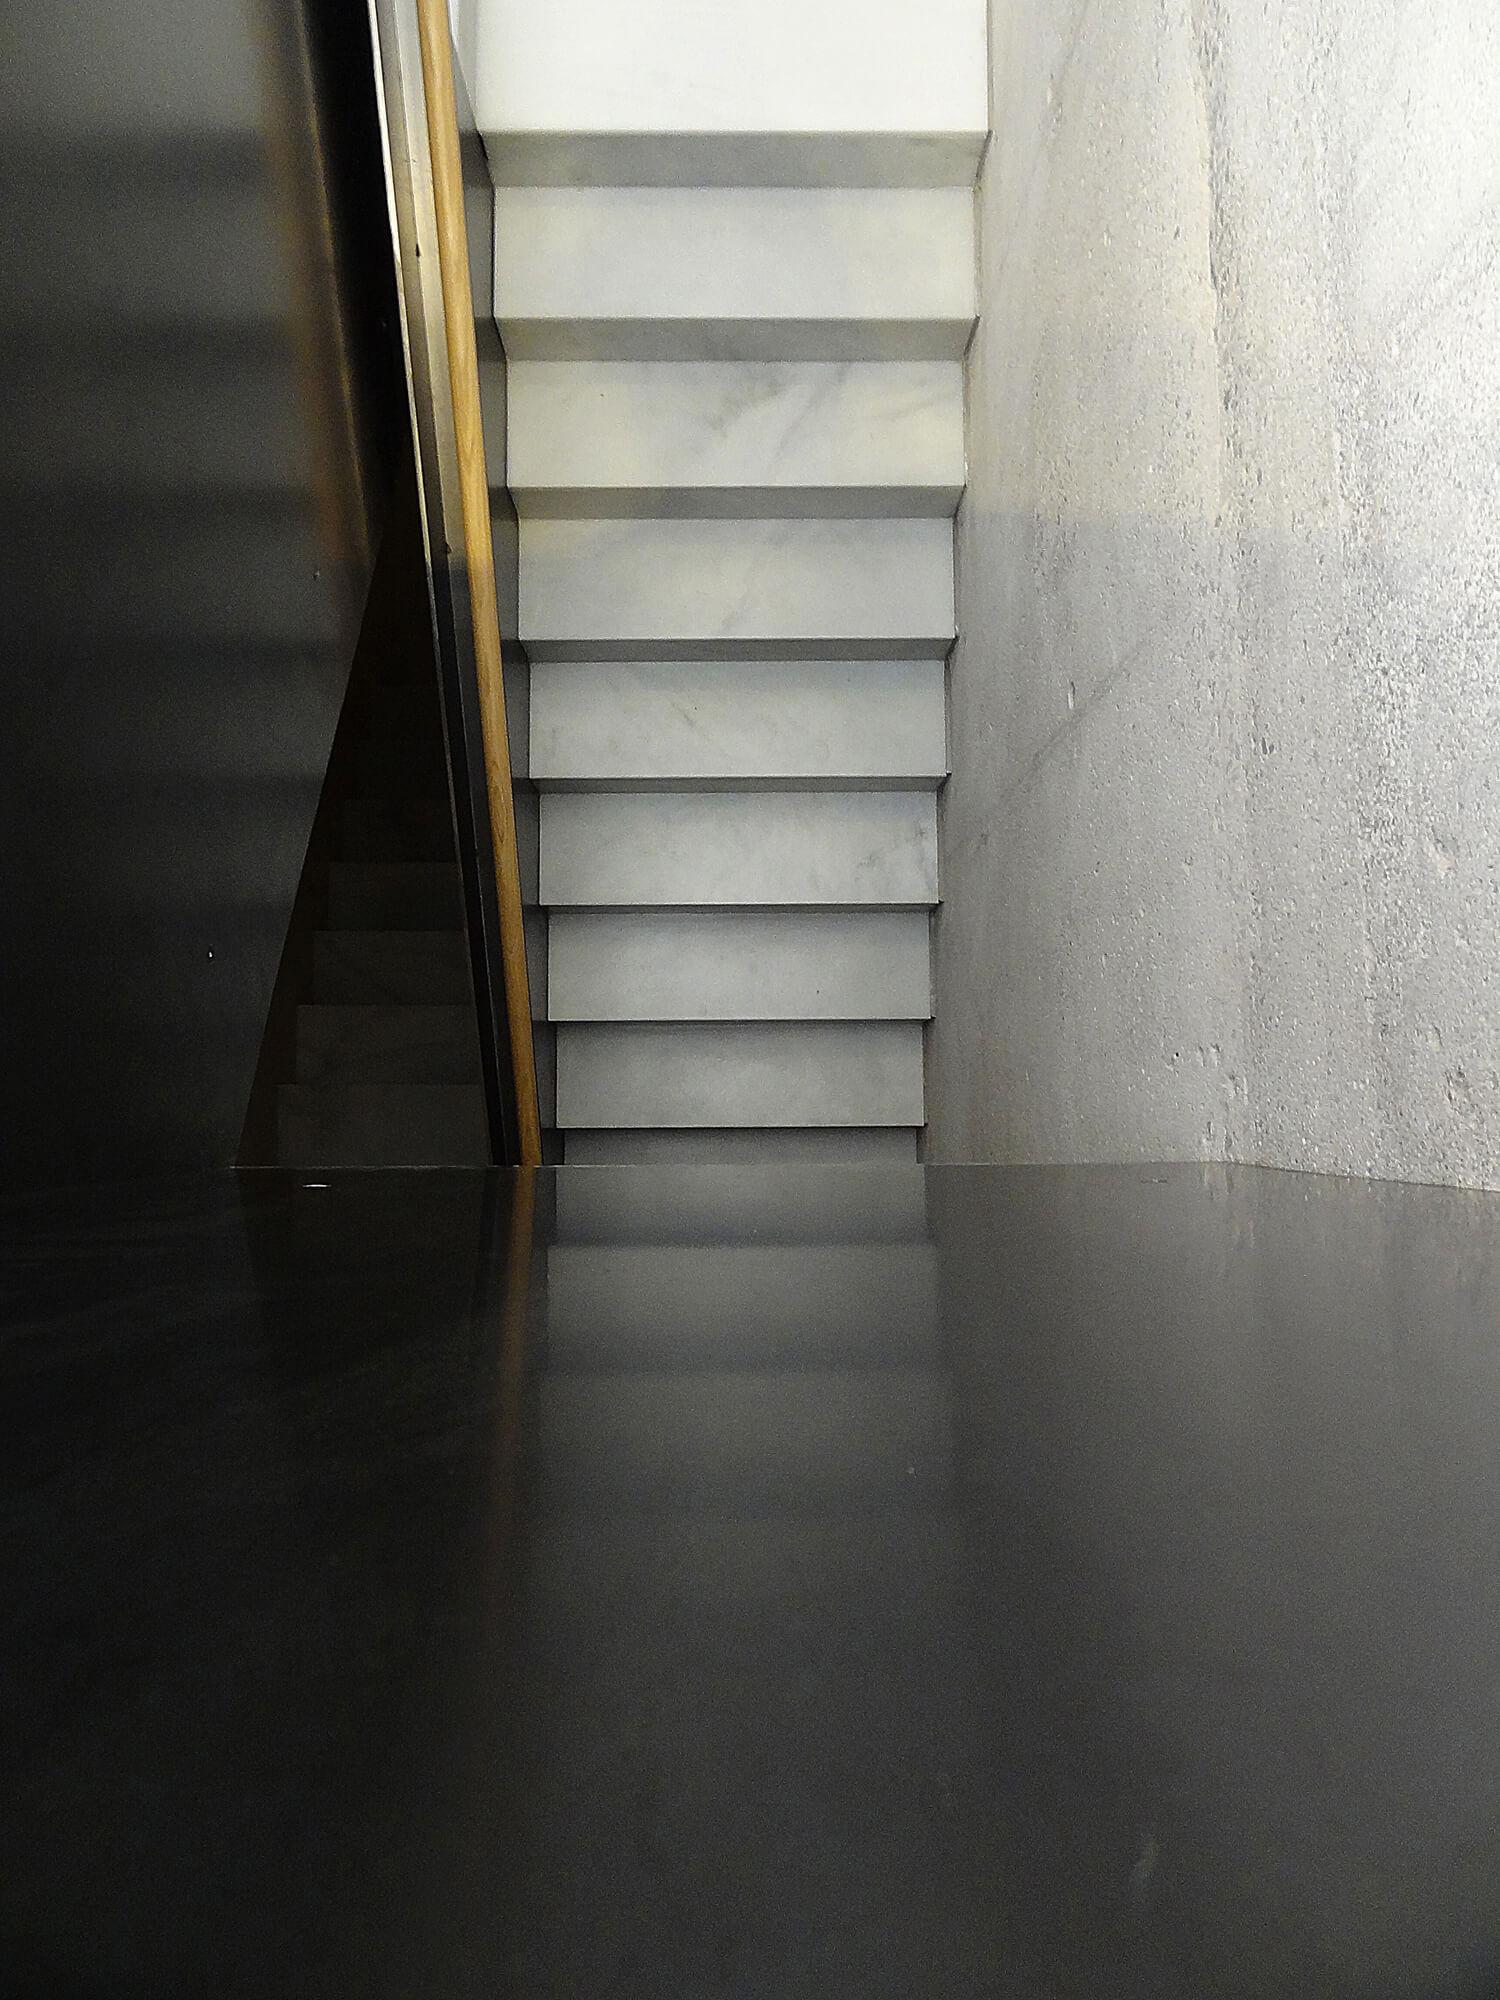 planell-hirsch_arquitectura_rehabilitacion_interiorismo_barcelona_born_mirallers_escalera-muro hormigon_chapa_marmol_DSC03700 p_mr